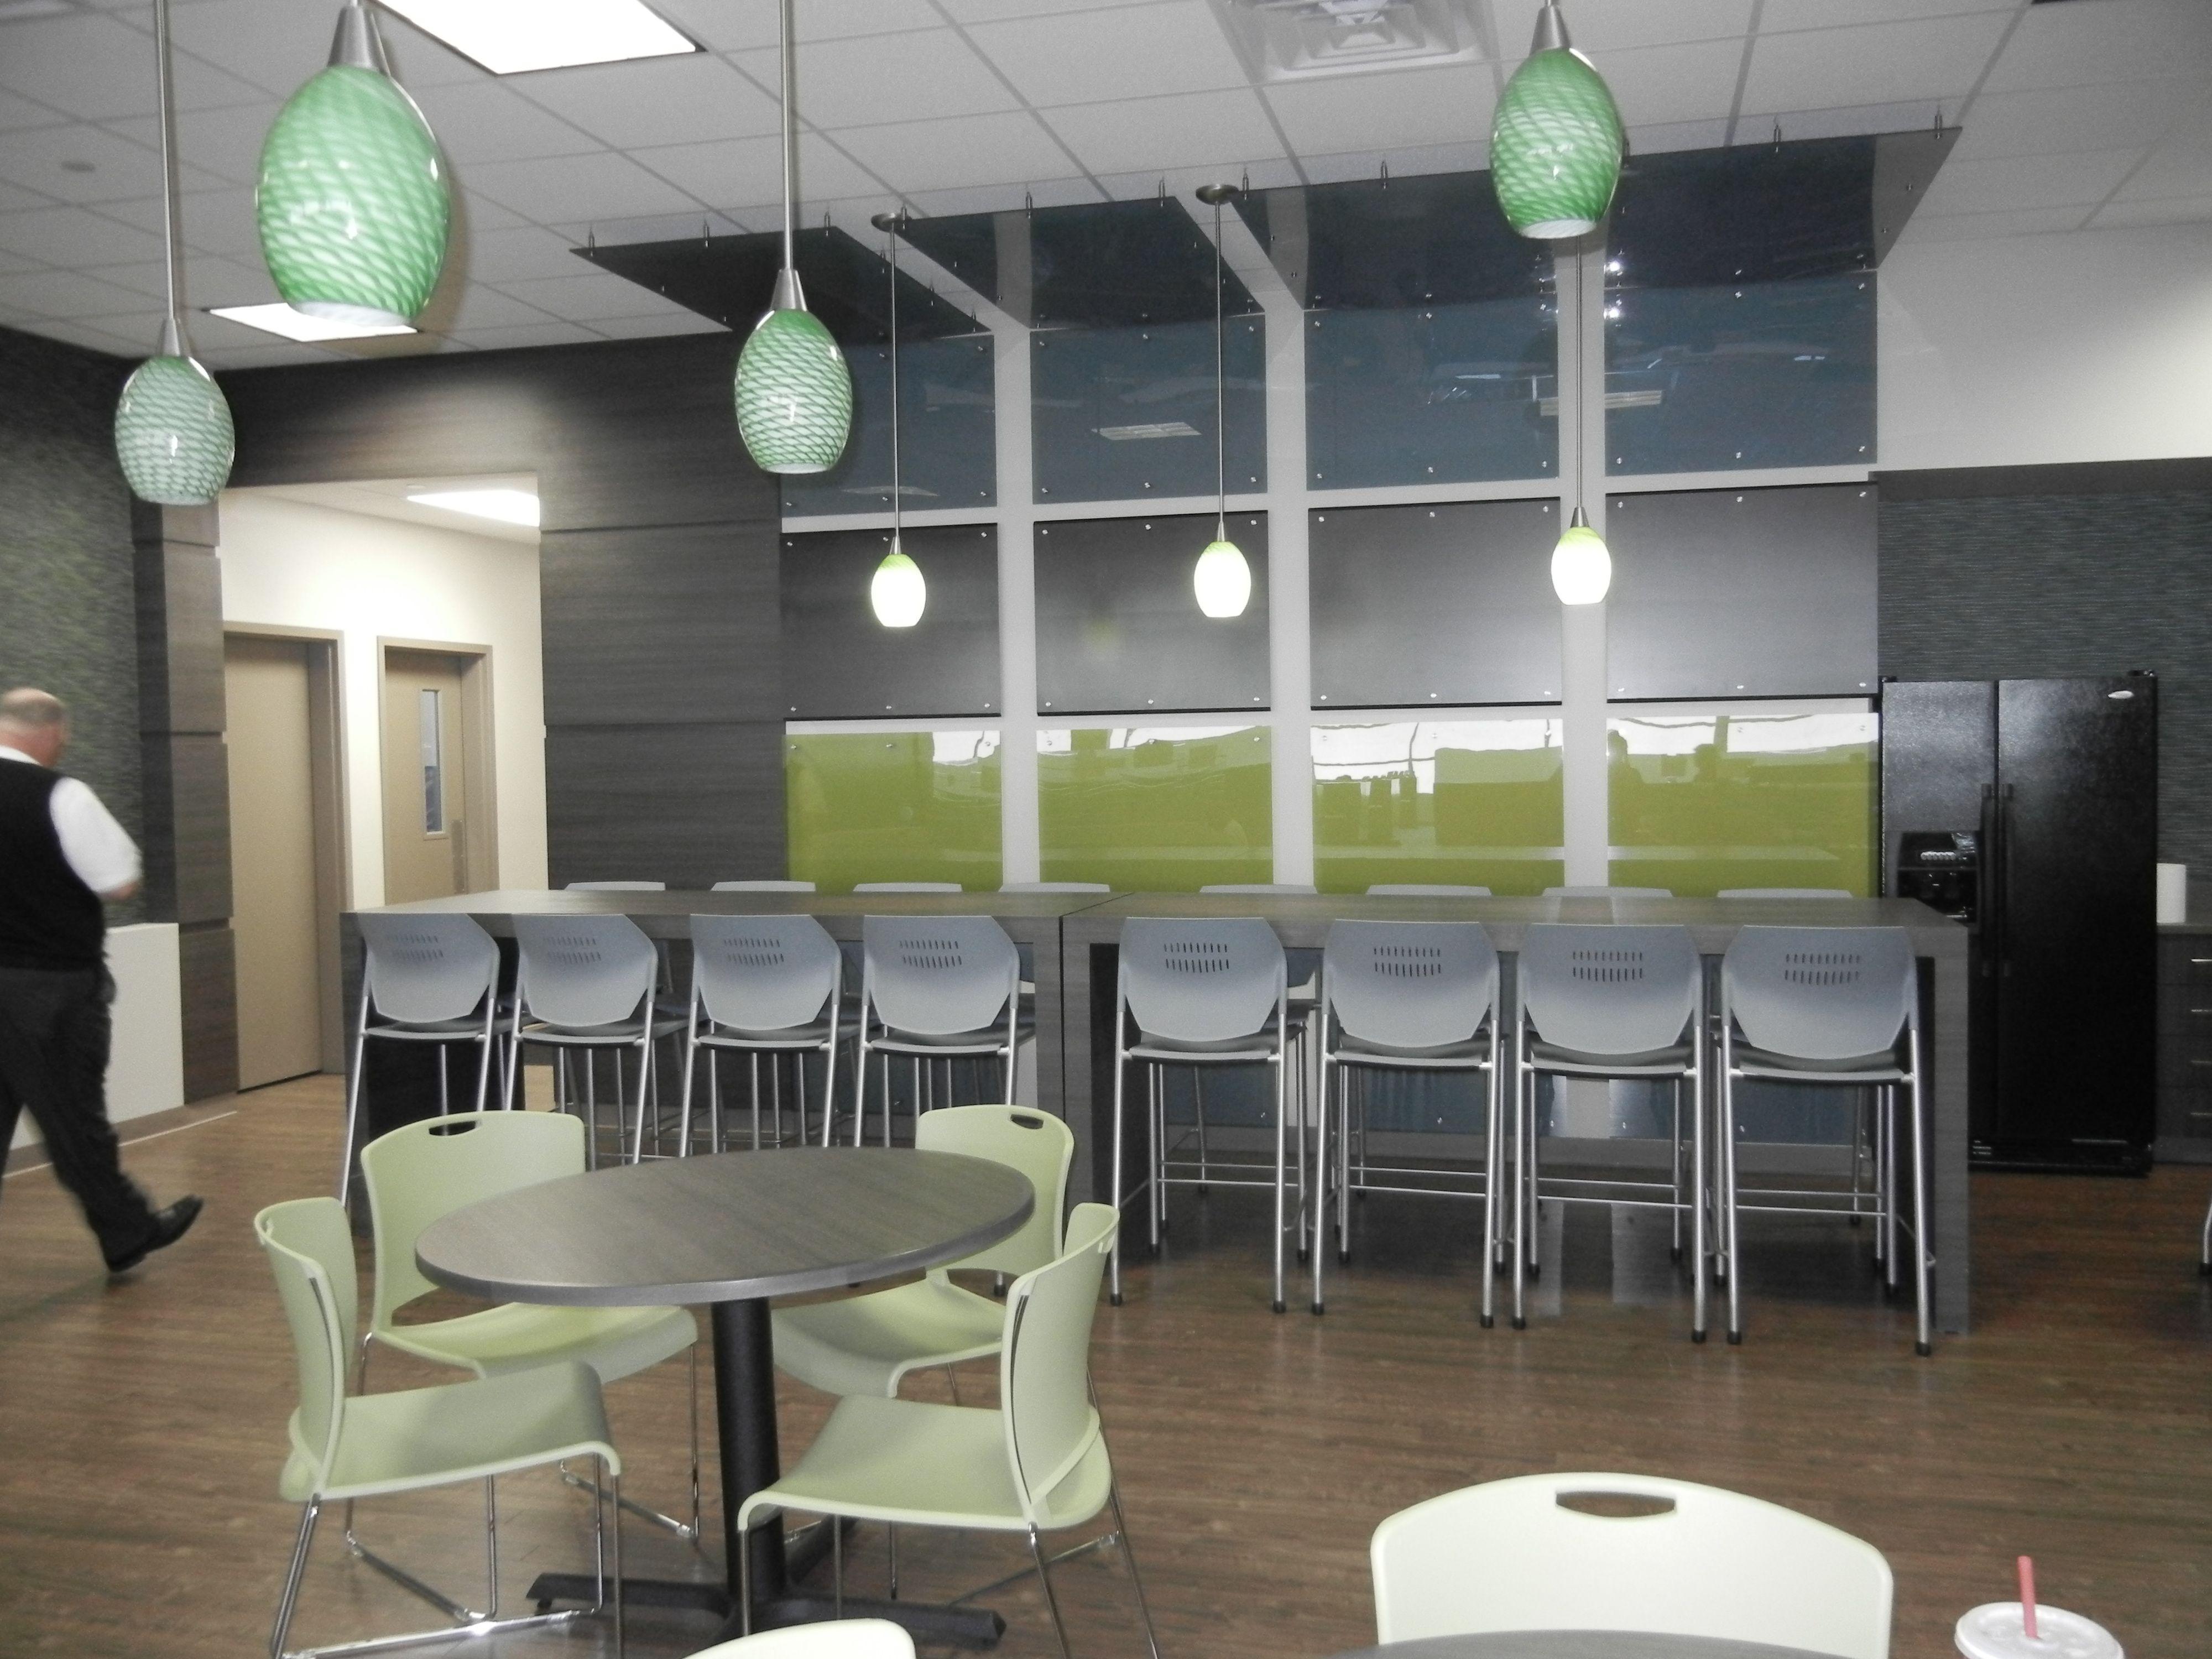 corporate office design interior design inalfa roofing systems technical center by comprehensive design - Linoleum Restaurant Interior